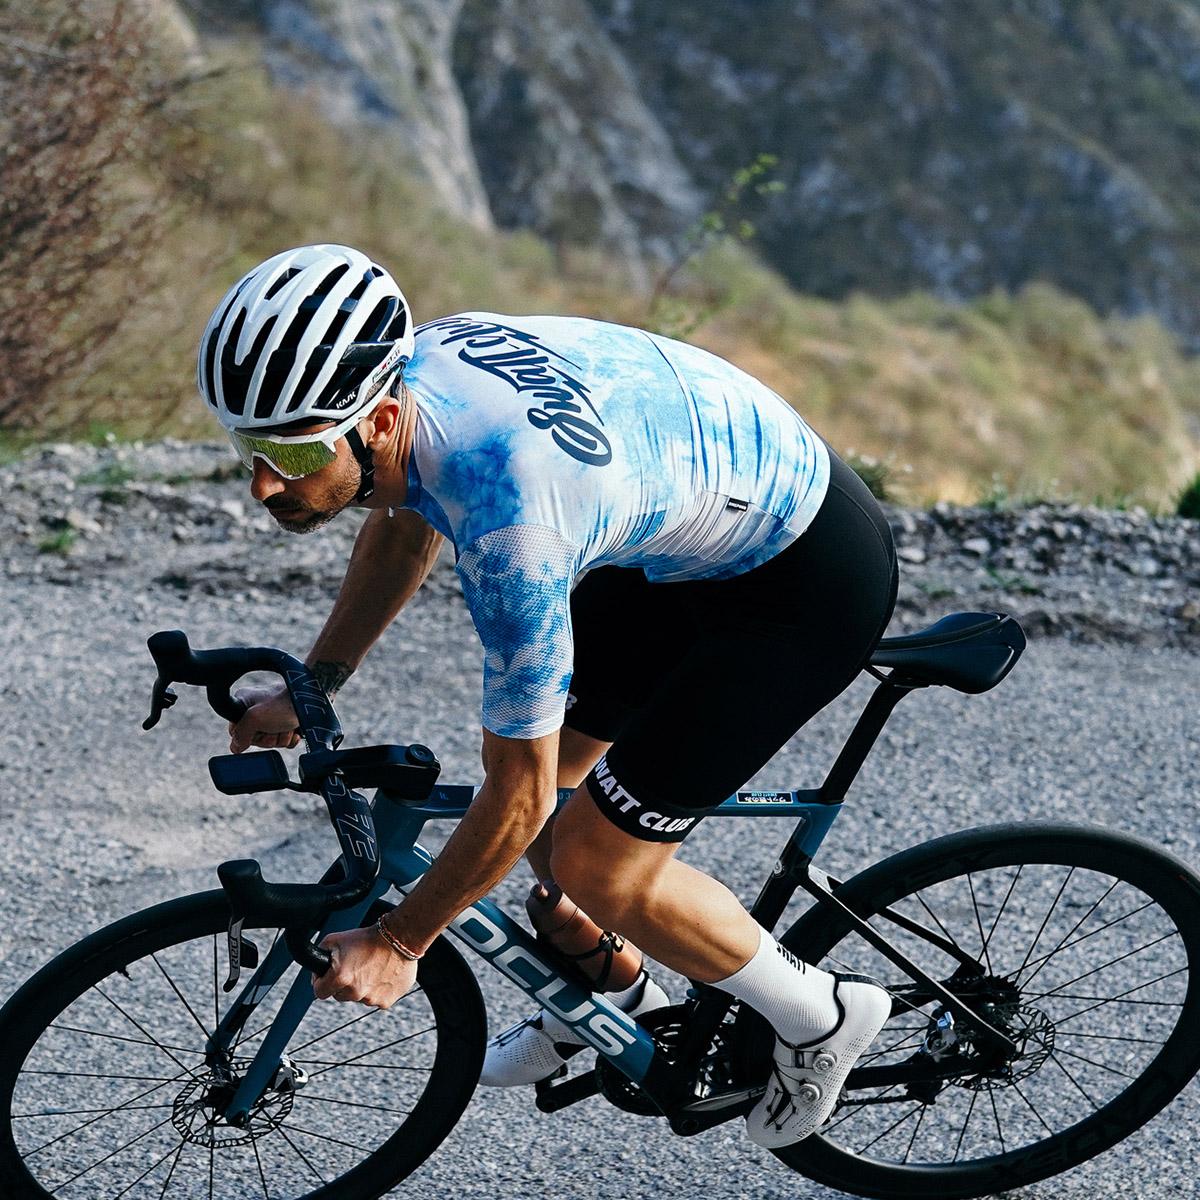 tiedye swatt club cycling jersey